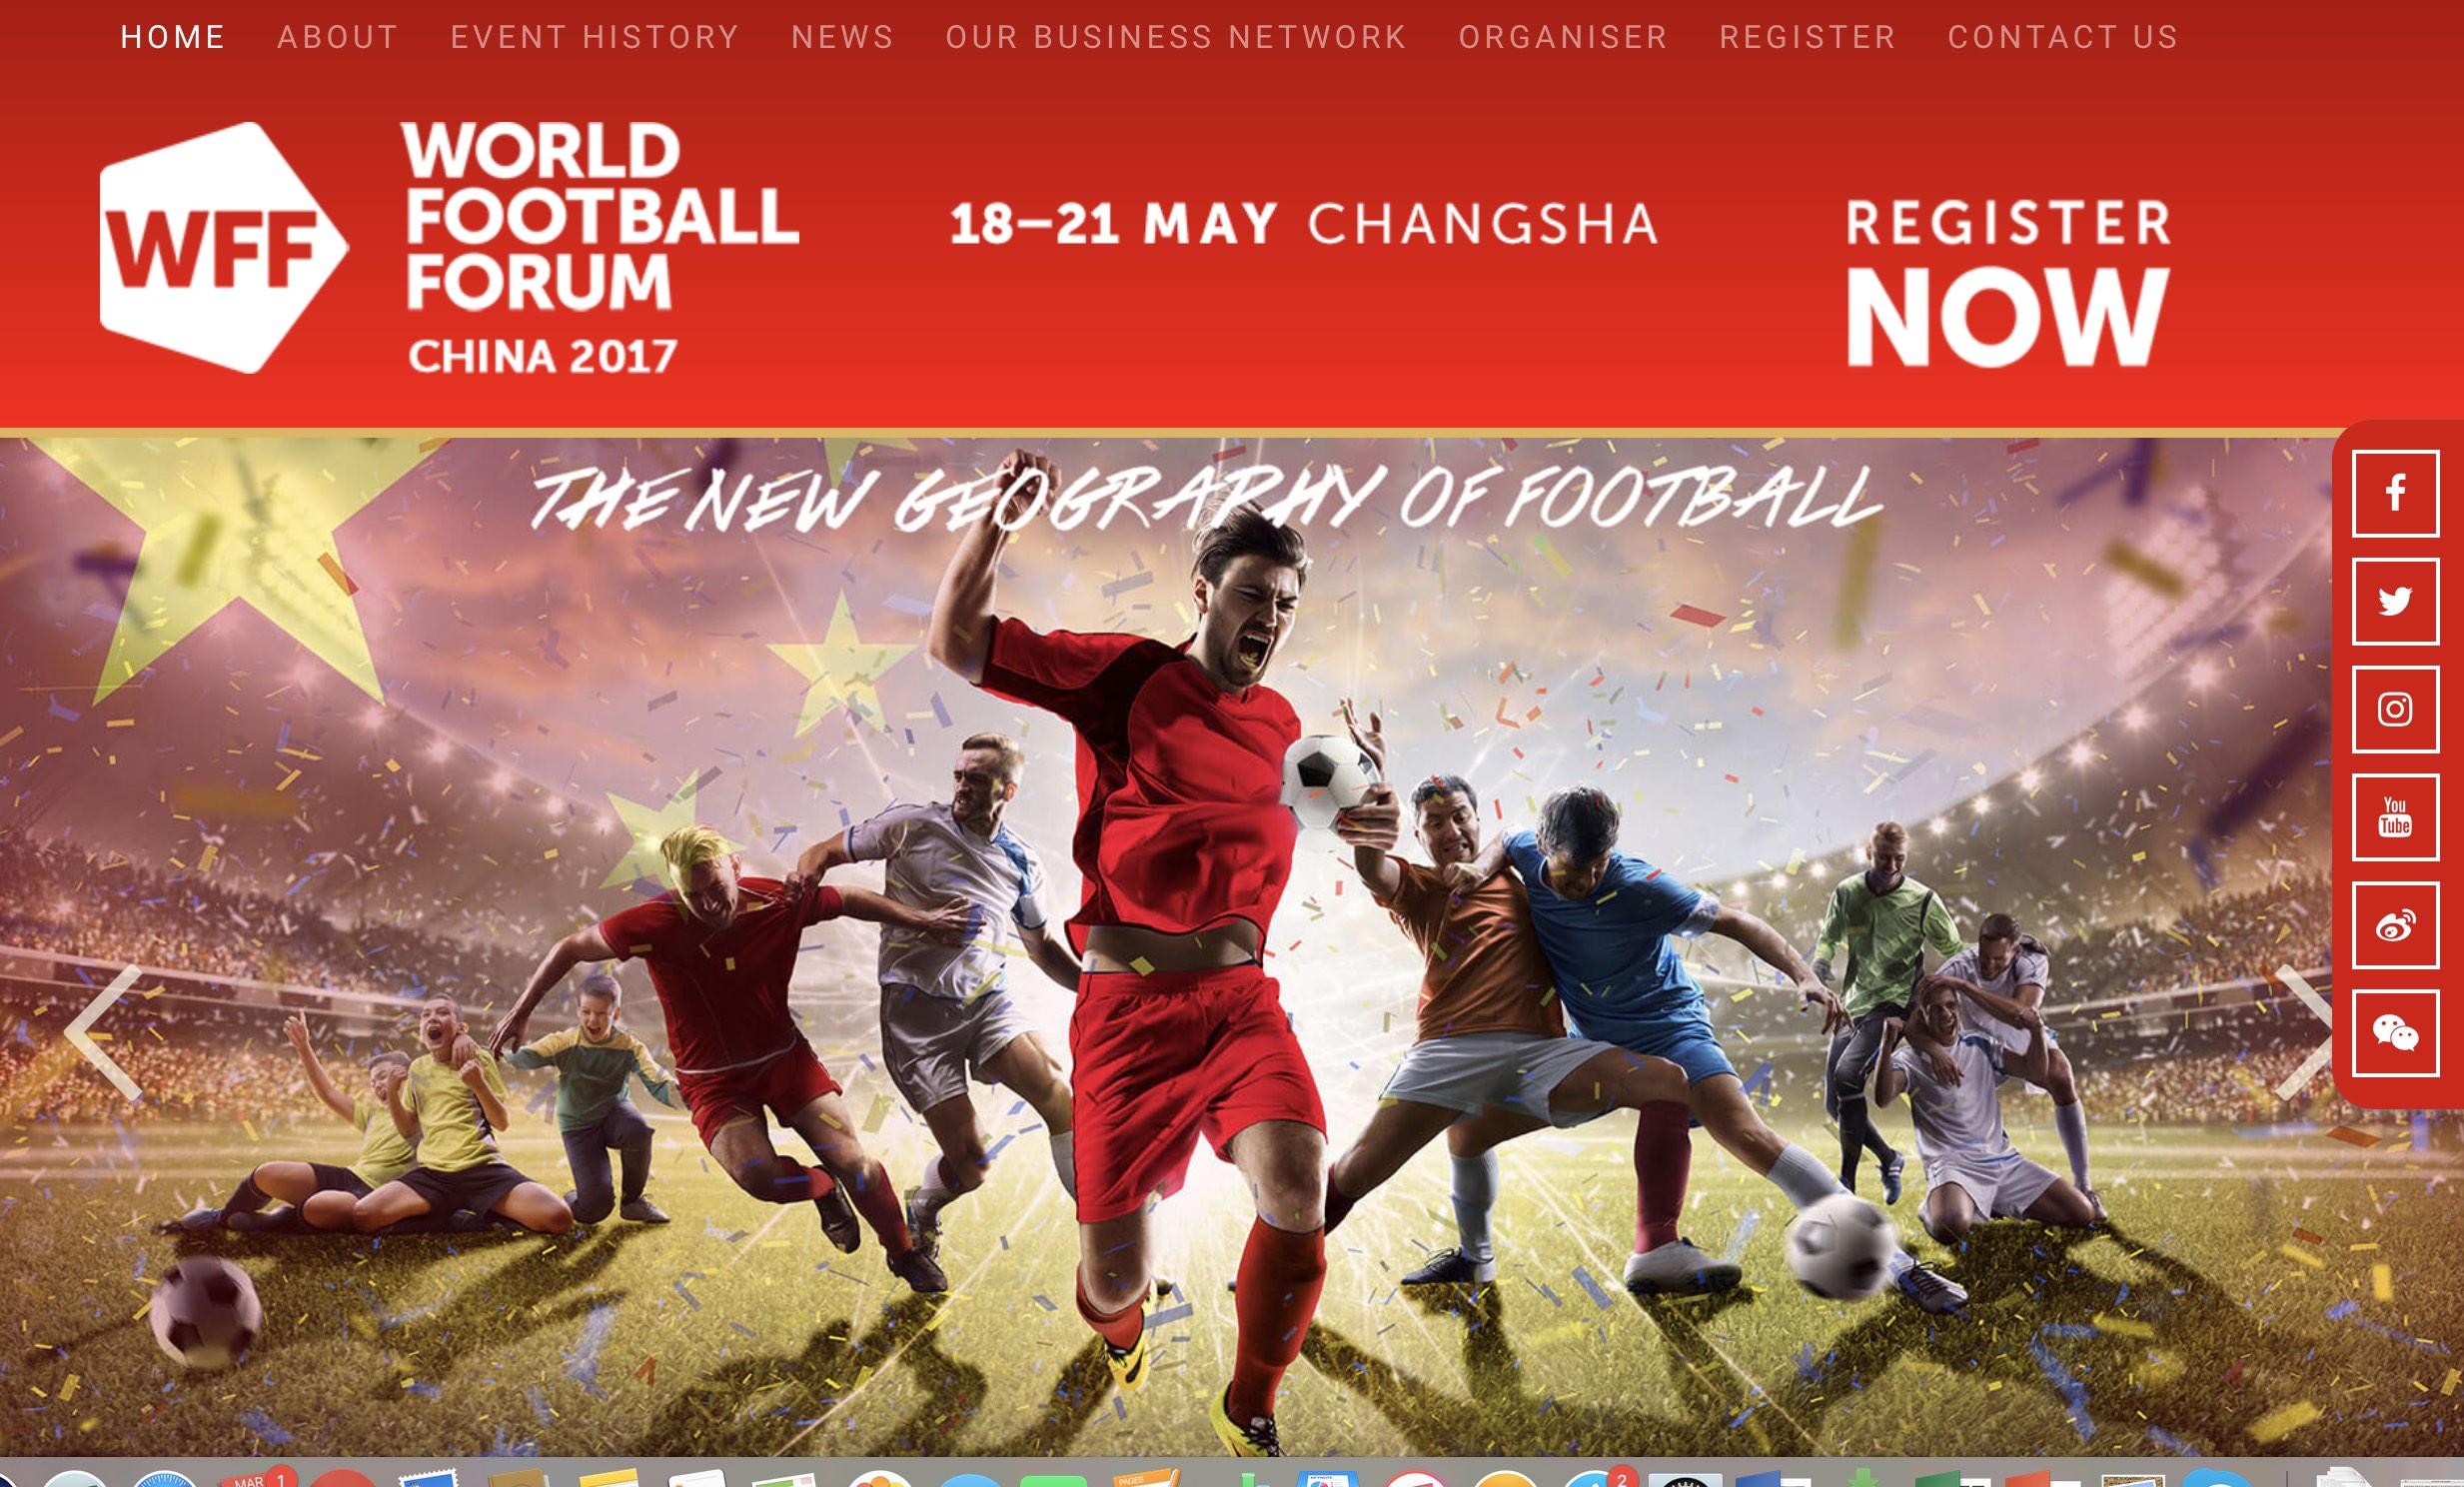 World Football Forum Changsha